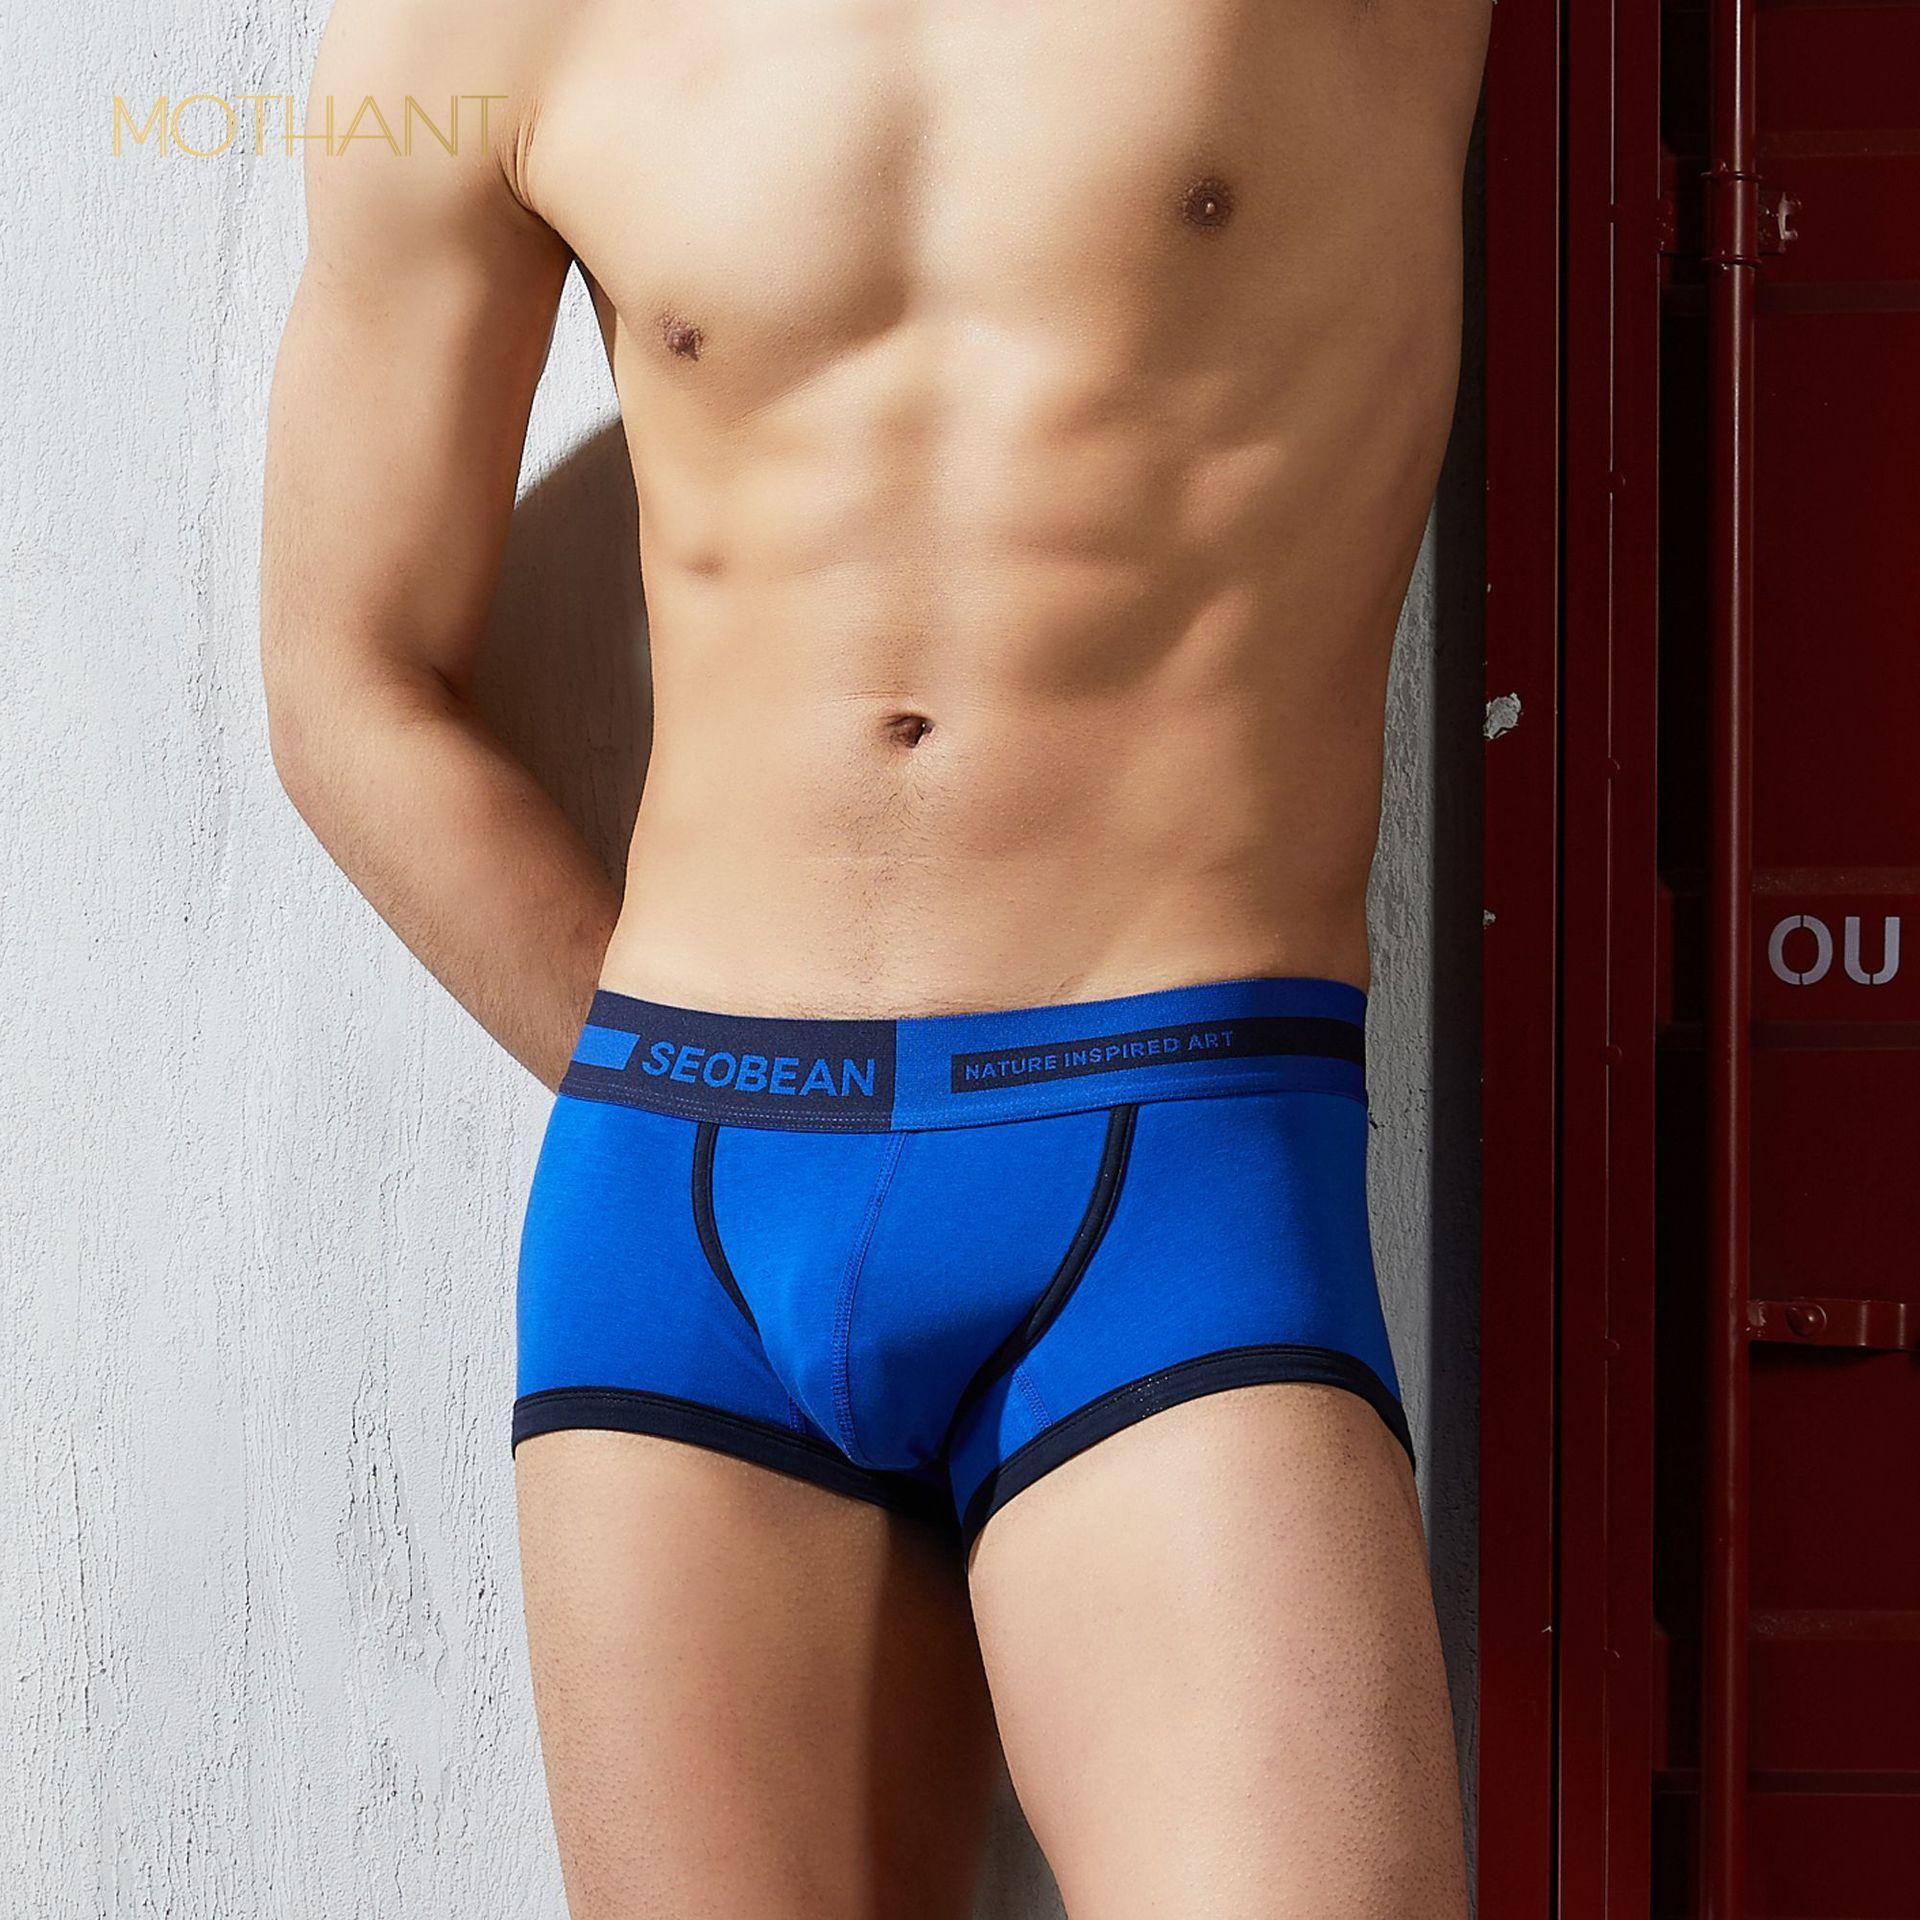 Men's Underwear Boxer Pants Men's Underwear Men's Cotton Underwear mens underwear boxers  cotton shorts  gifts for men